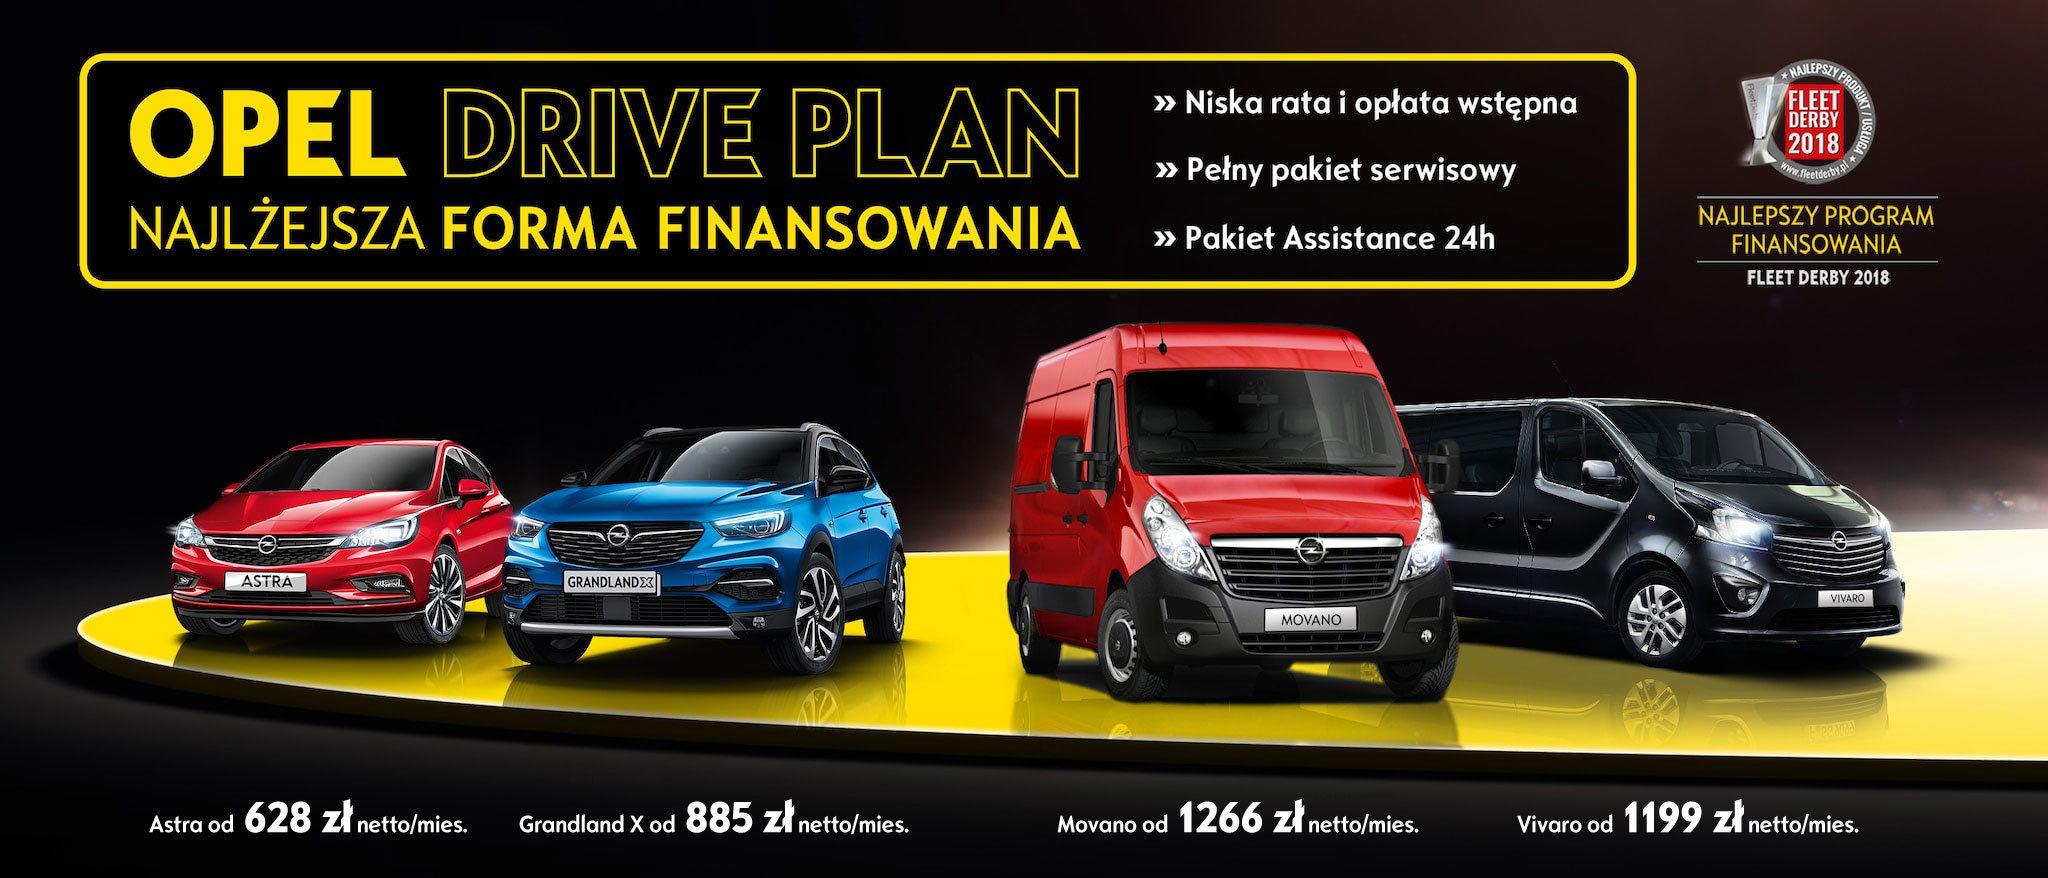 Abonament Opel Drive Plan. Astra, Grandland X, Movano, Vivaro